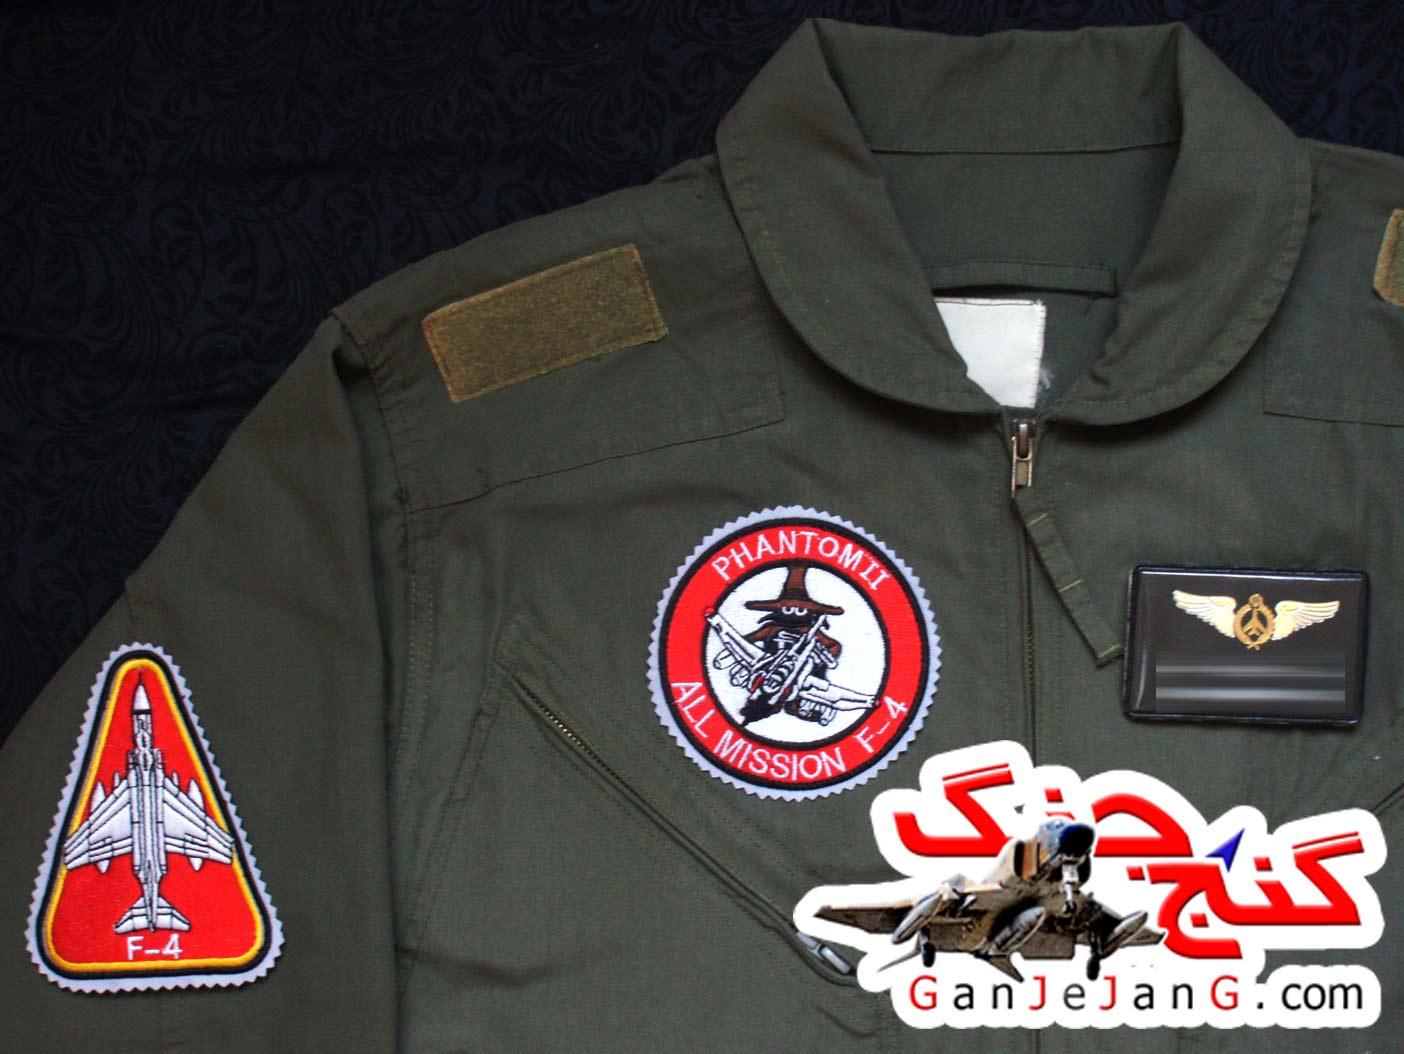 آرم سینه تمام دوخت خلبان لیدر سوم اف-4 فانتوم